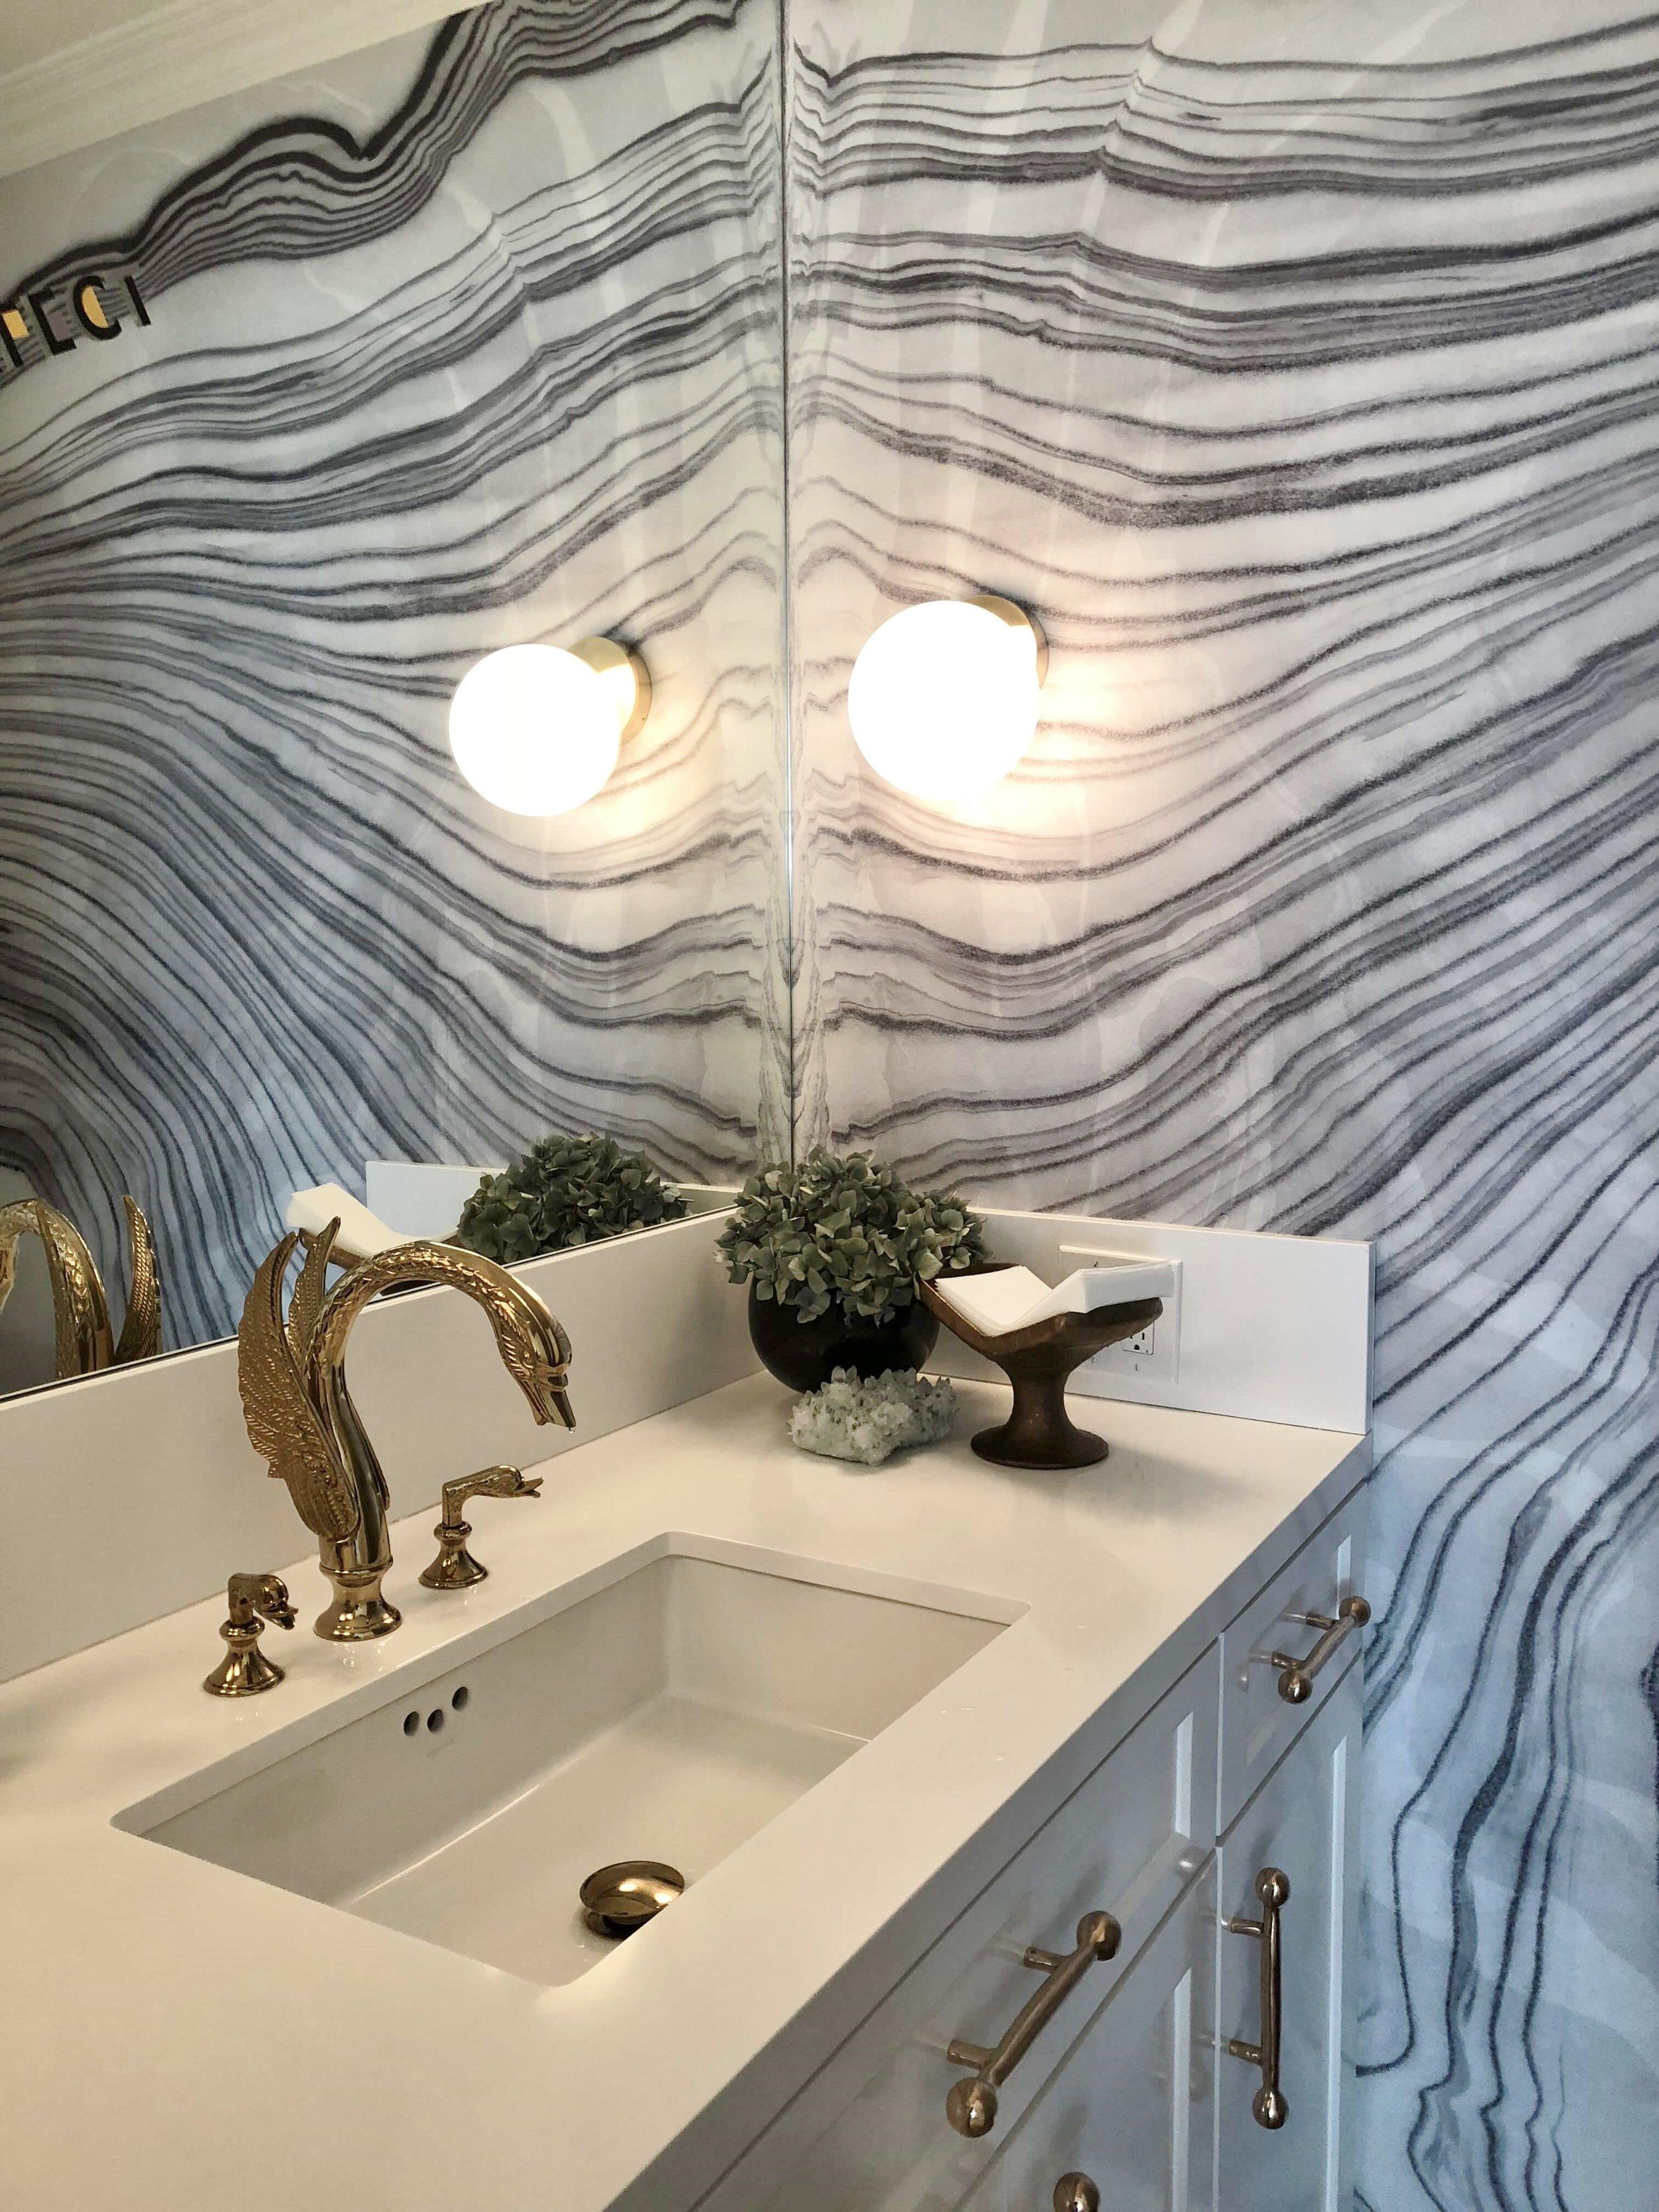 POWDER BATH ROUND UP |Powder room with marbleized wallpaper and swan faucet on the  LA Design Trail, Casa Perfect  #powderbath #powderroom